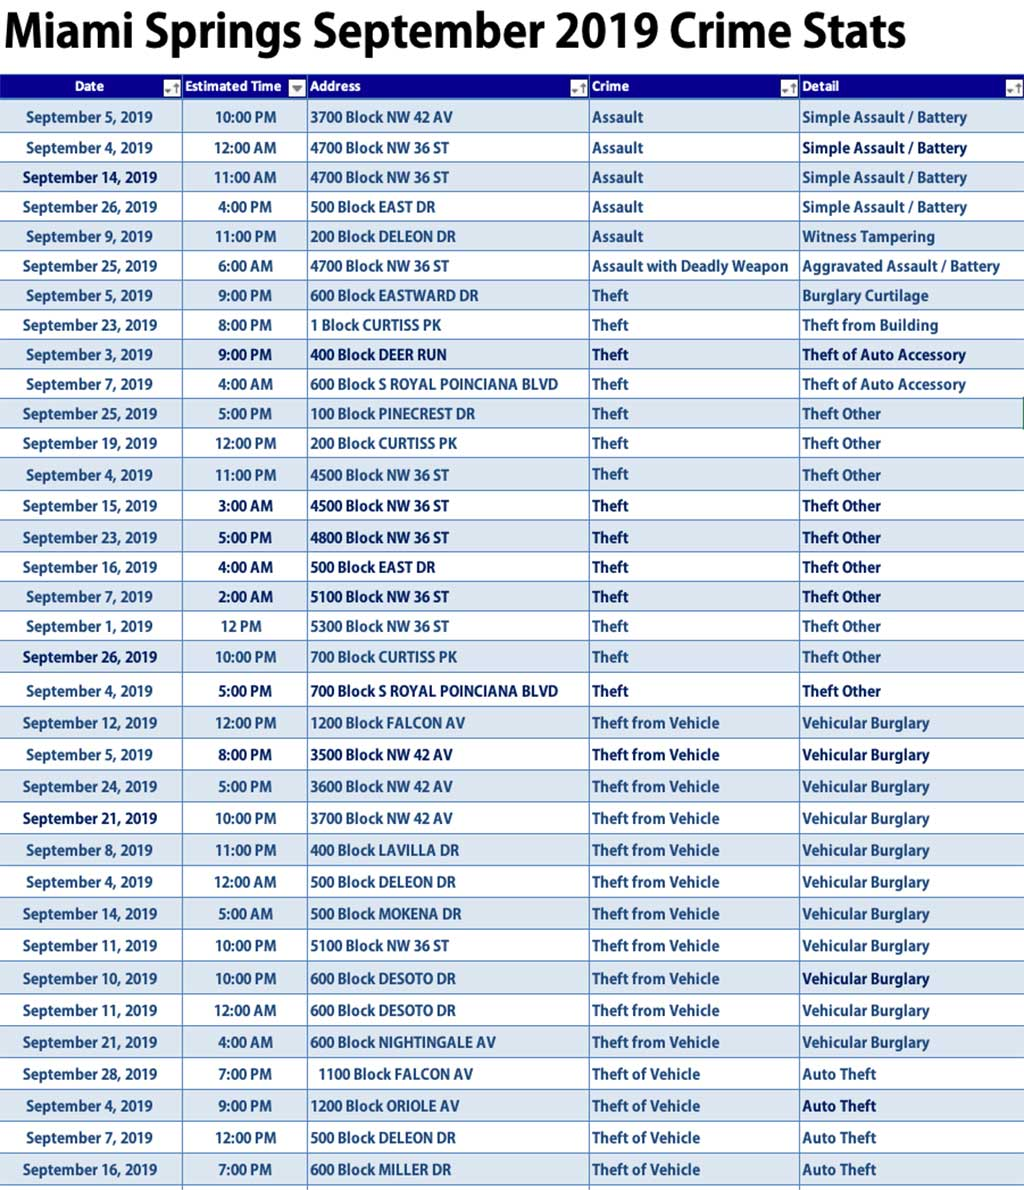 Miami Springs September 2019 Crime Summary